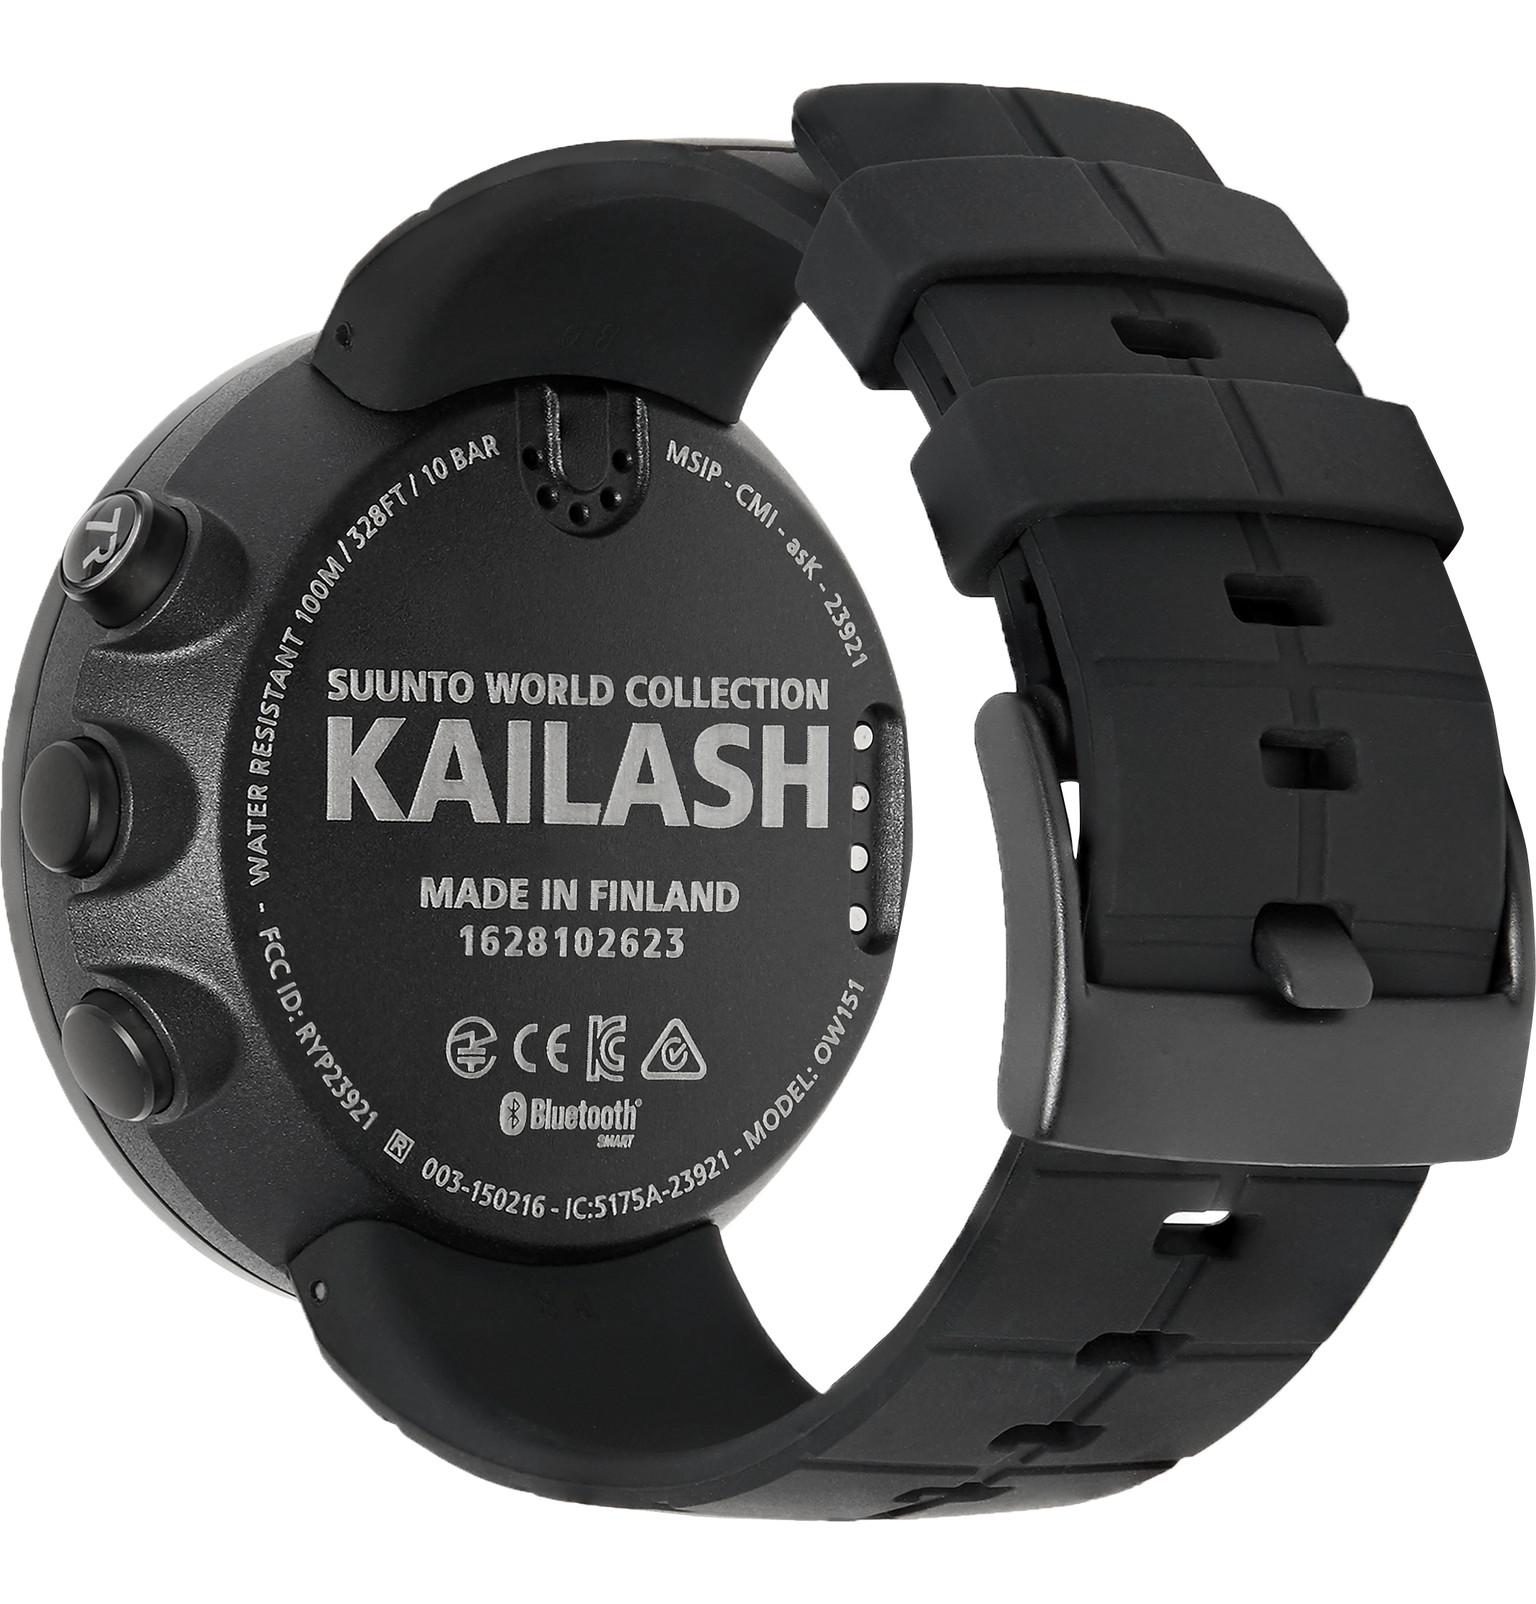 ... Travel Smart Watch Source · Suunto Kailash Alarm Unisex Watch SS021238000 Suunto Watches Source SuuntoKailash Carbon Tone Titanium GPS Watch